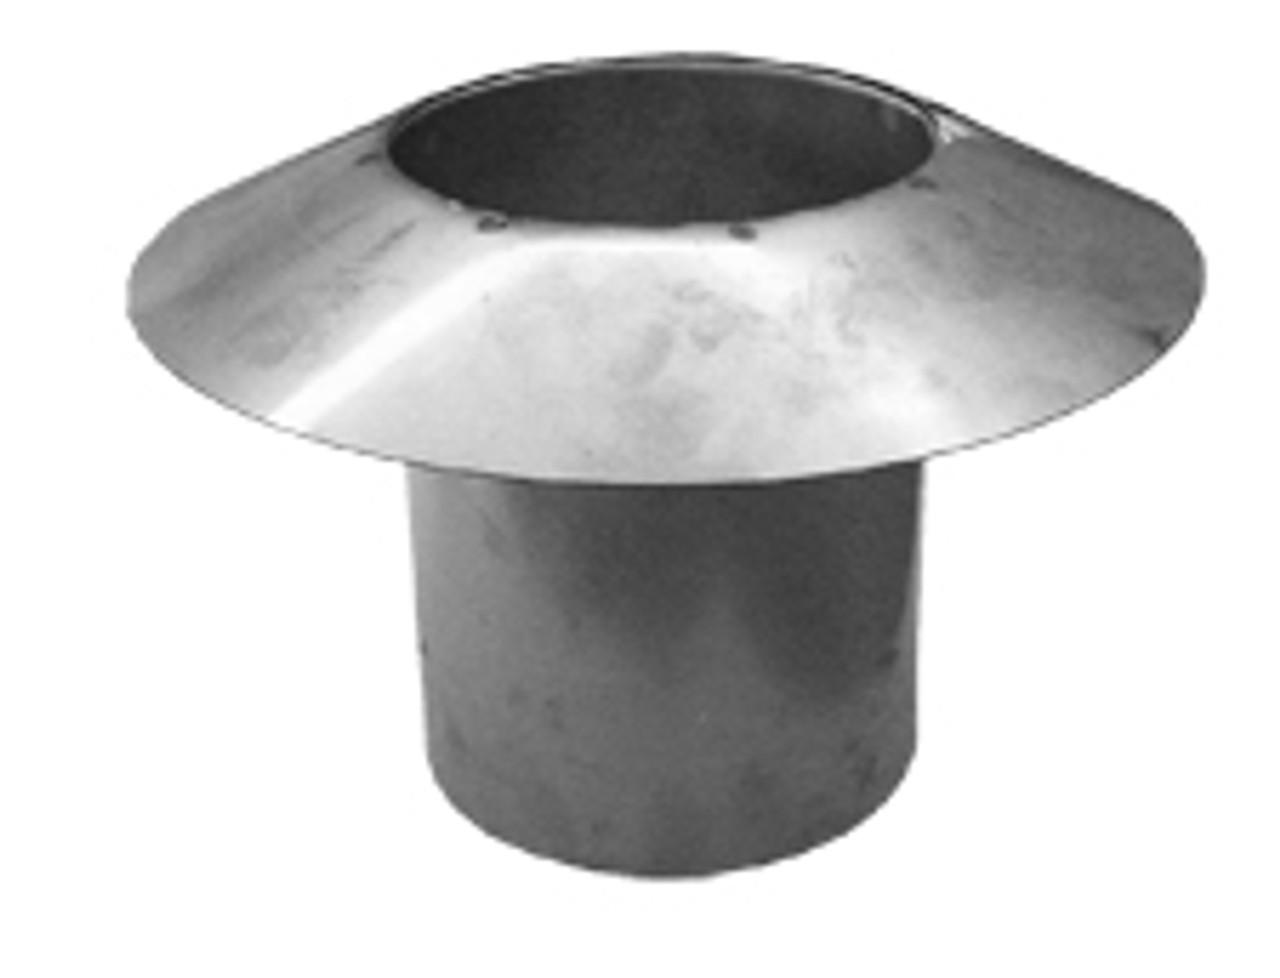 Flexible Flue Liner Pot Hanger